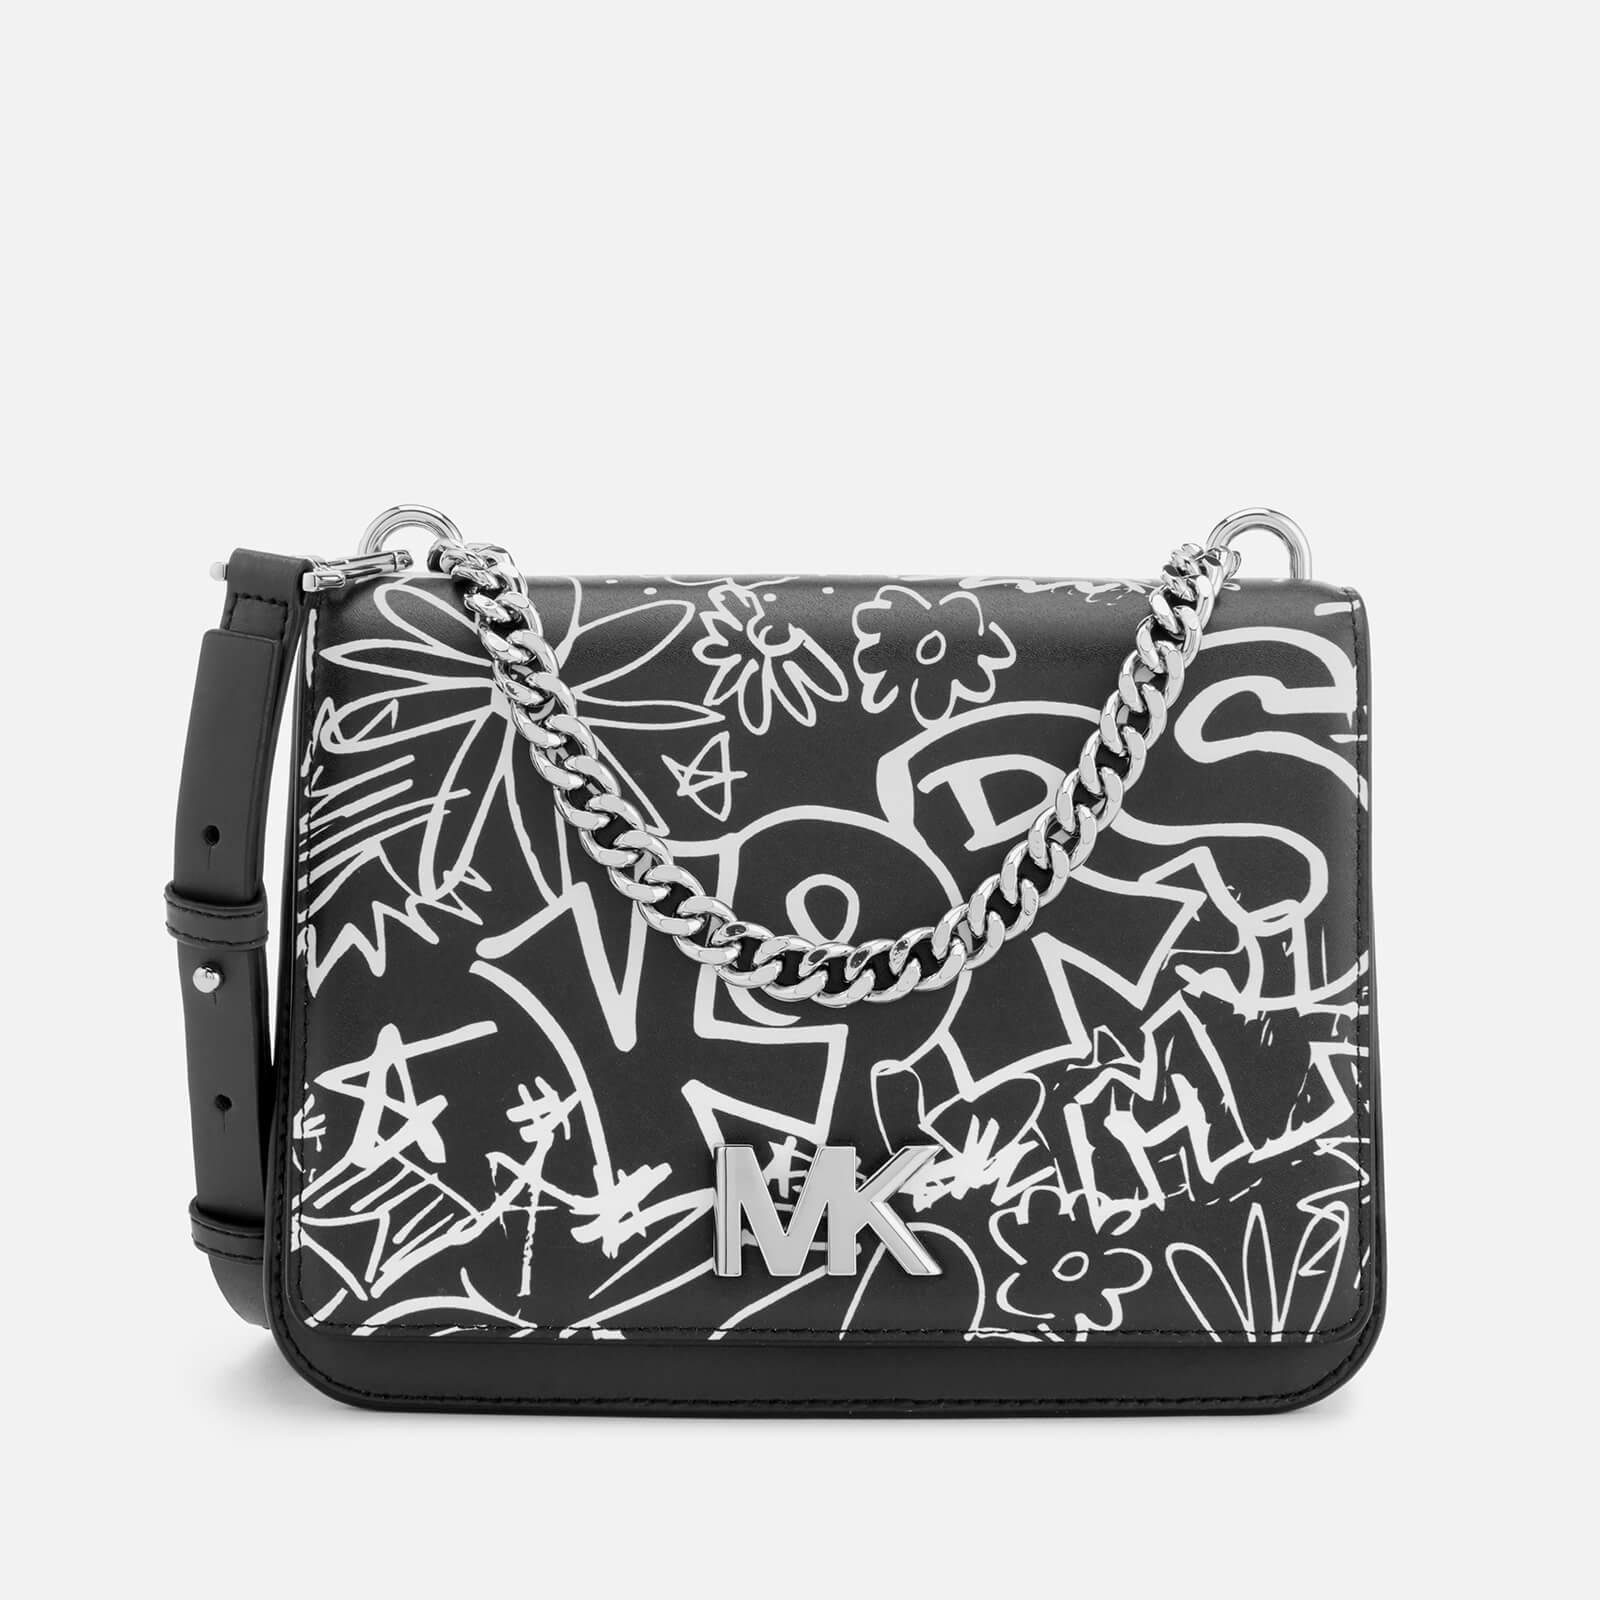 cdd2a25cb036 MICHAEL MICHAEL KORS Women's Graffiti Calia Leather Cross Body Bag - Black  - Free UK Delivery over £50